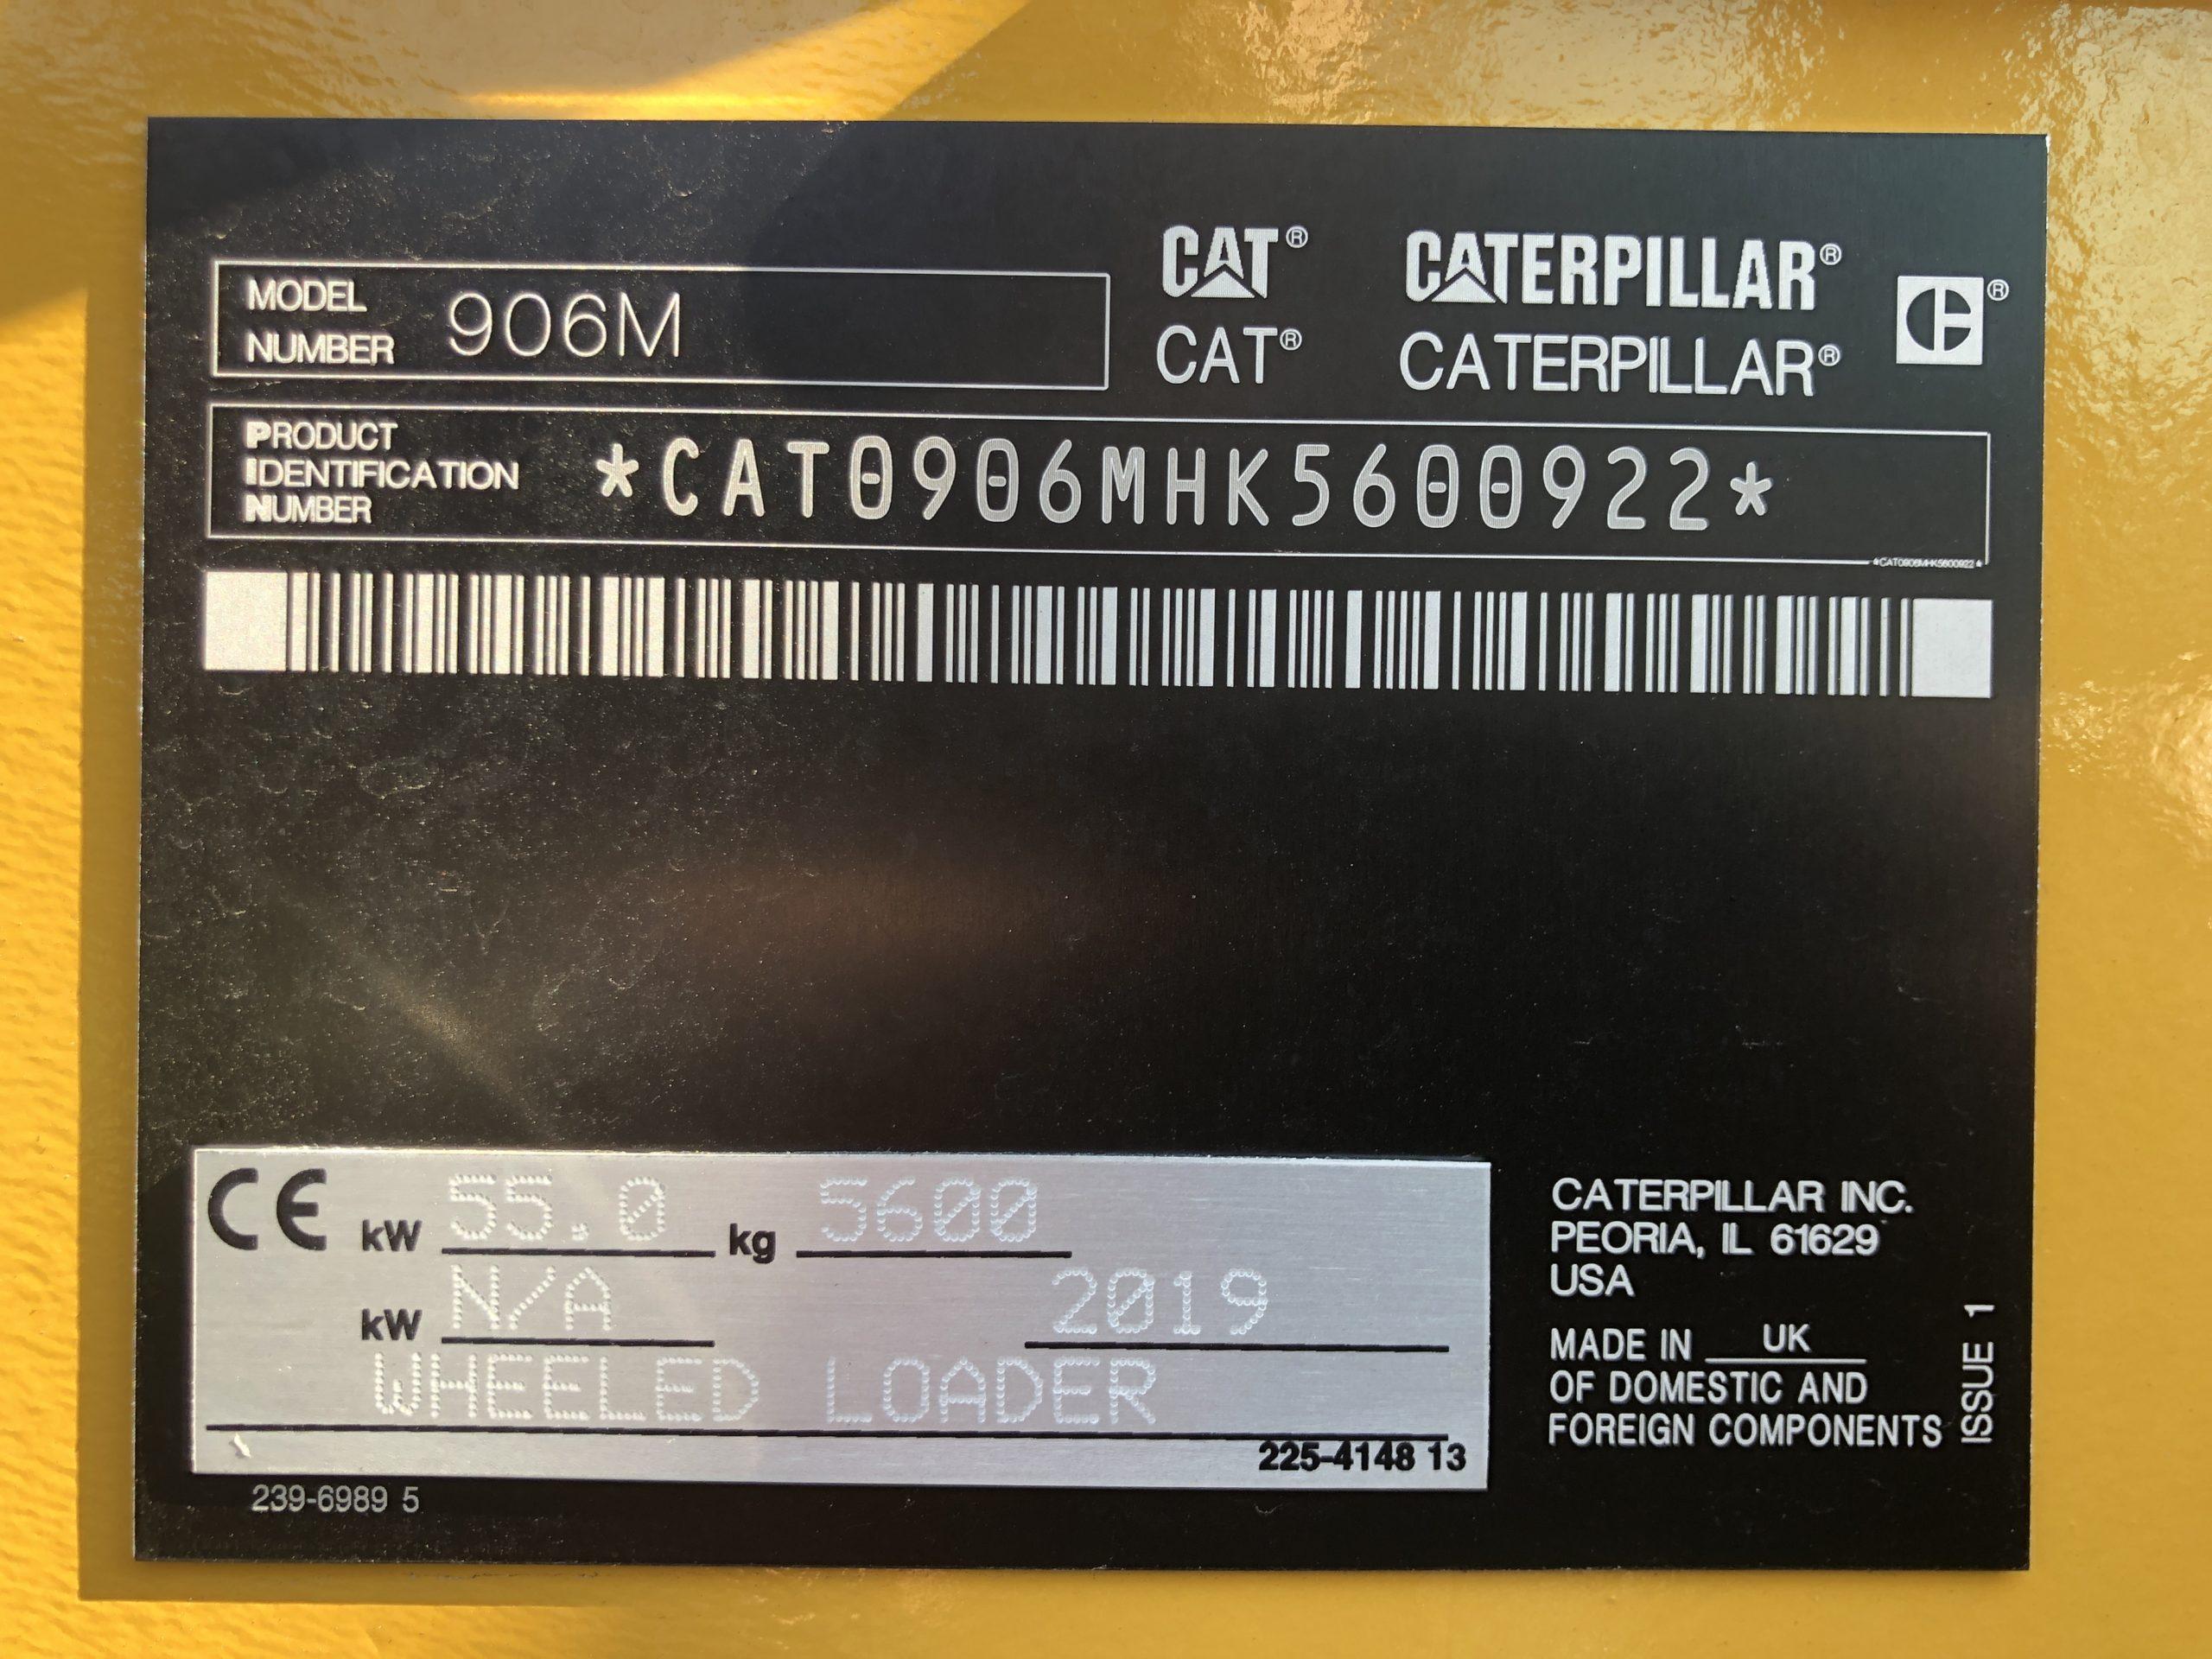 CATERPILLAR 906M CP032